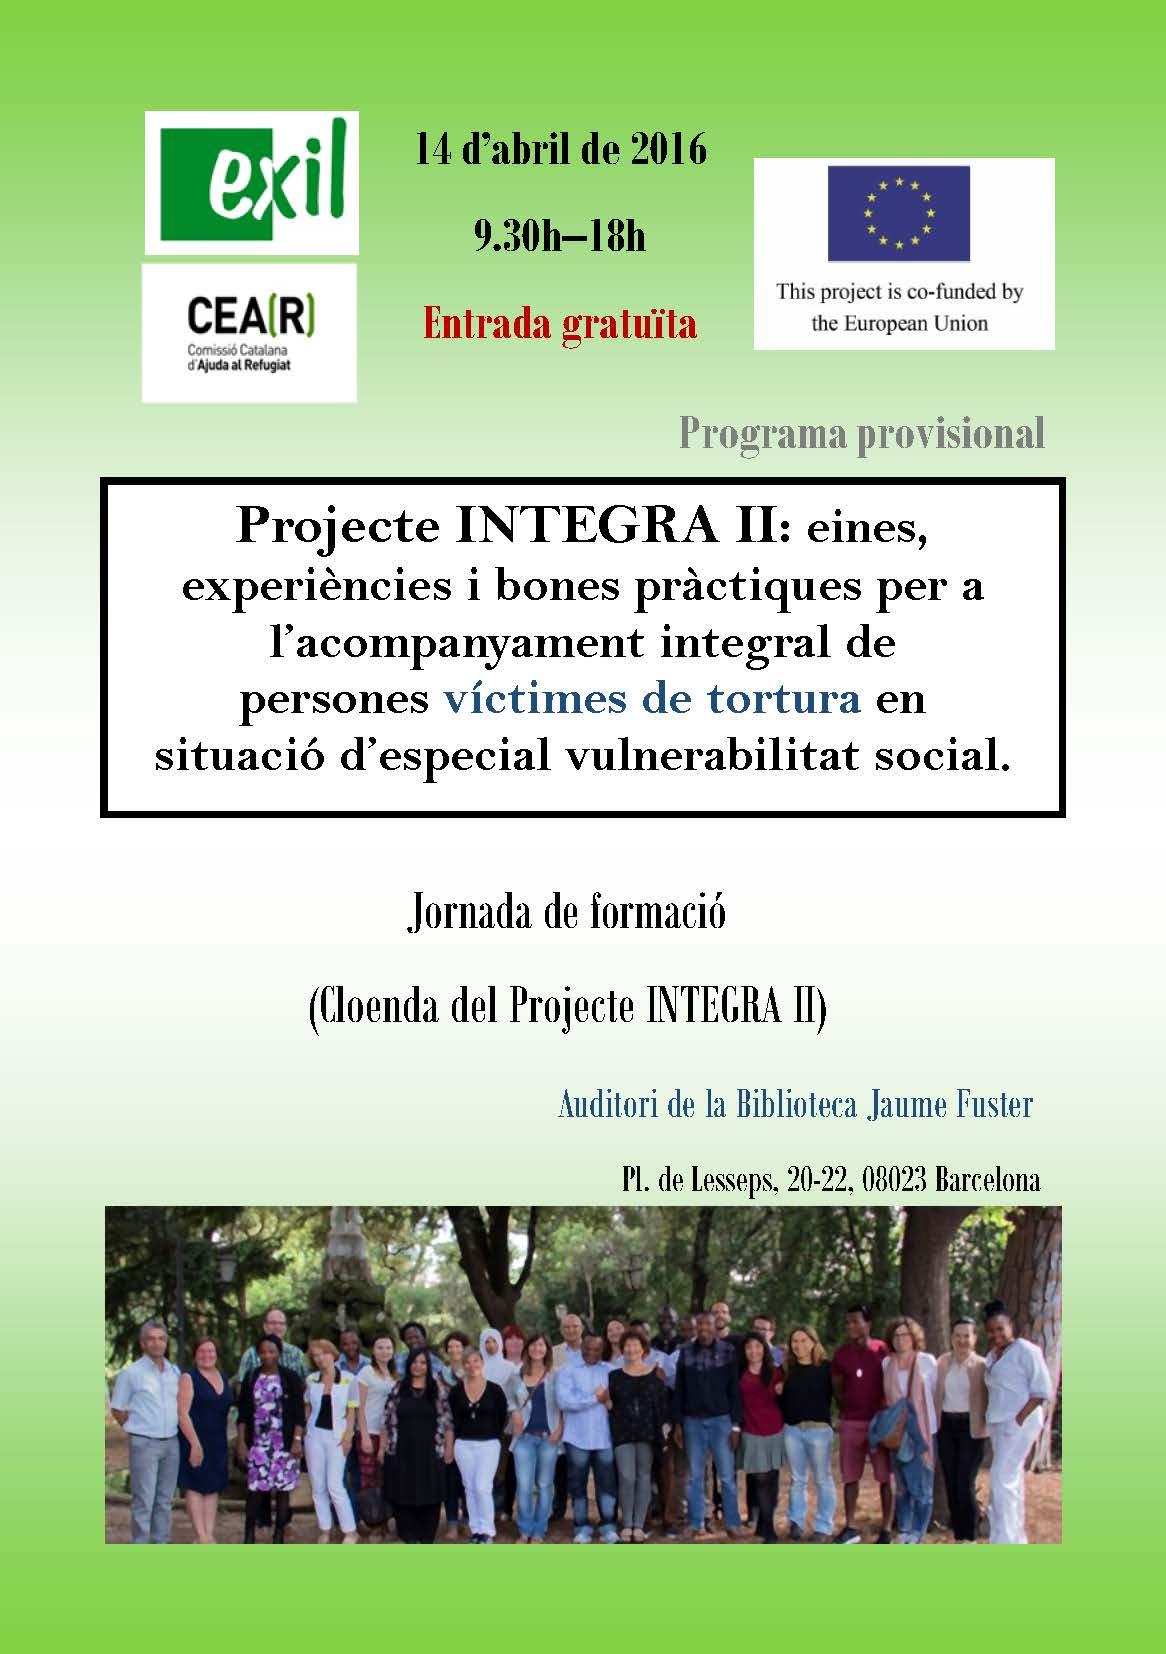 programa_provisional_cloenda_integra_ii.